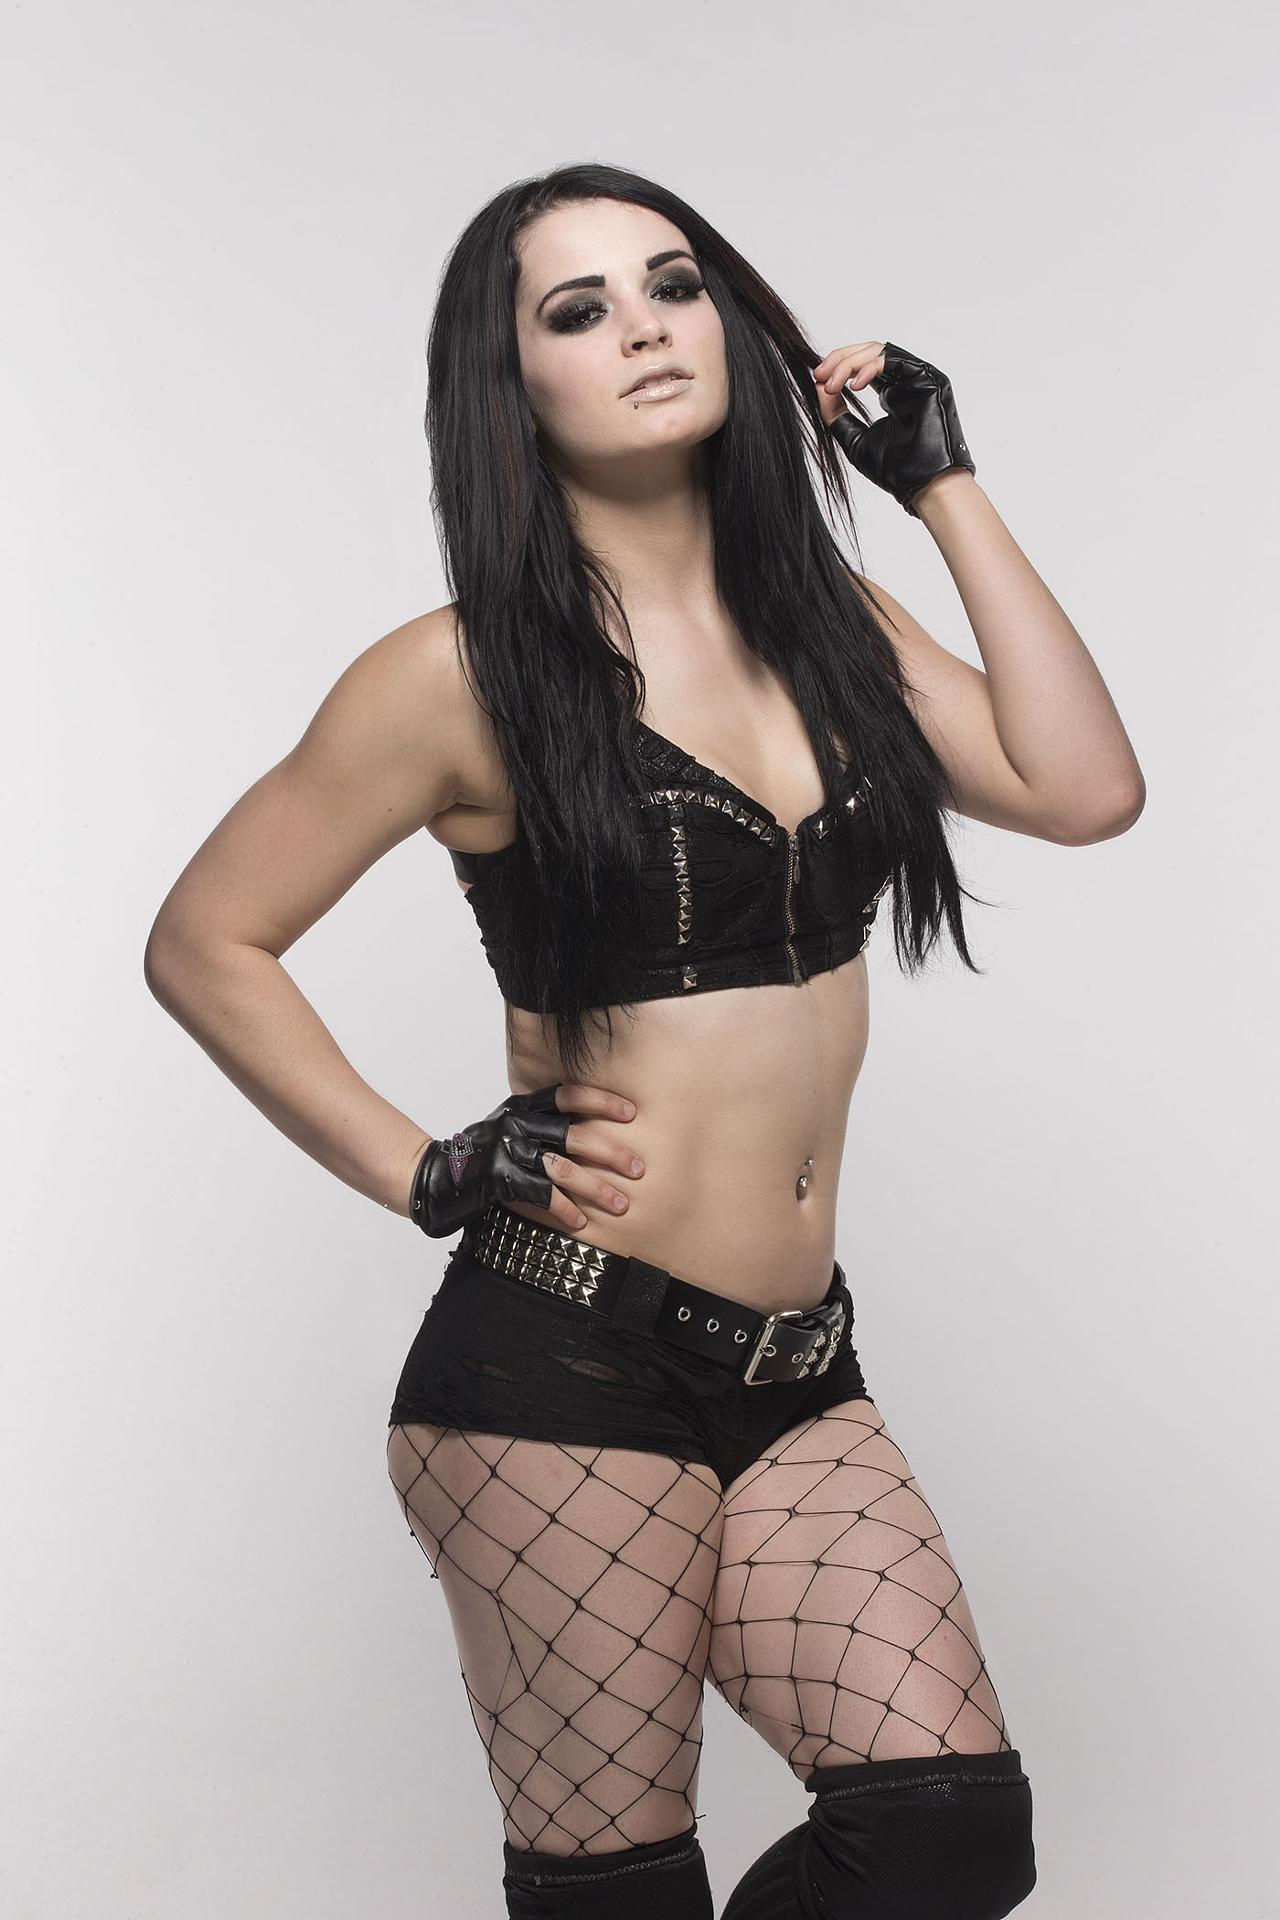 Saraya-Jade Bevis - IMDbPro